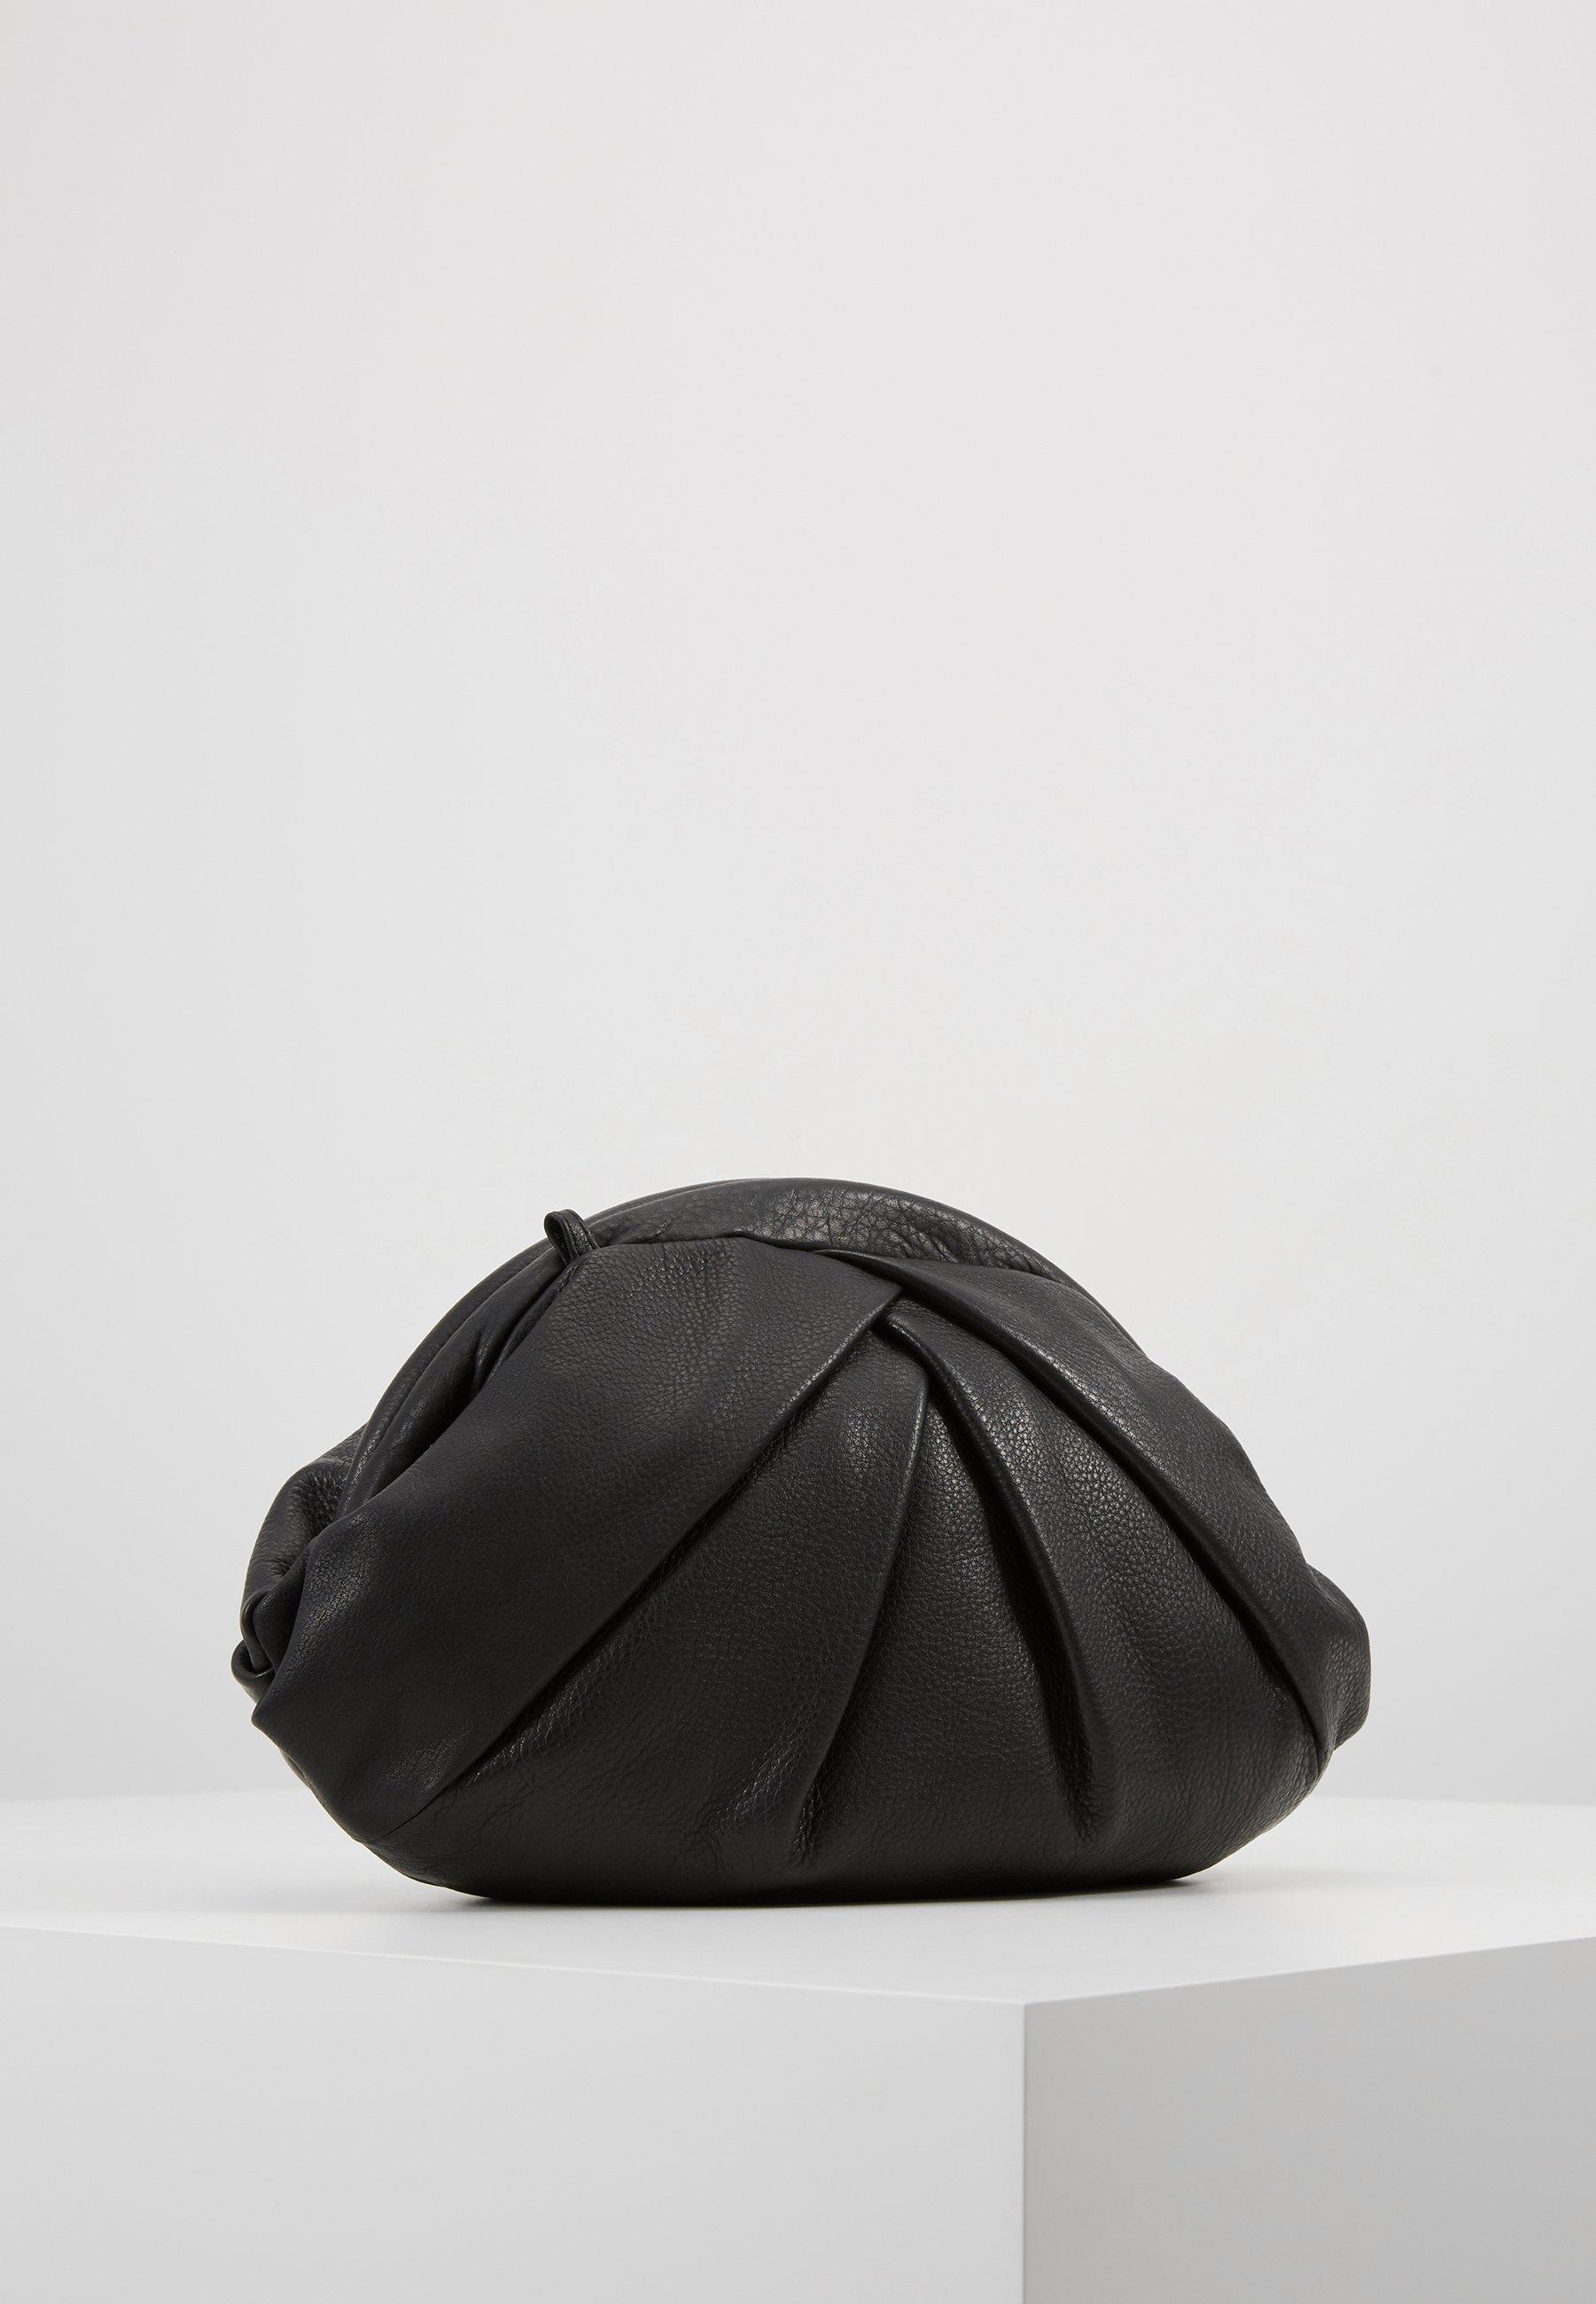 Núnoo Saki - Clutches Black